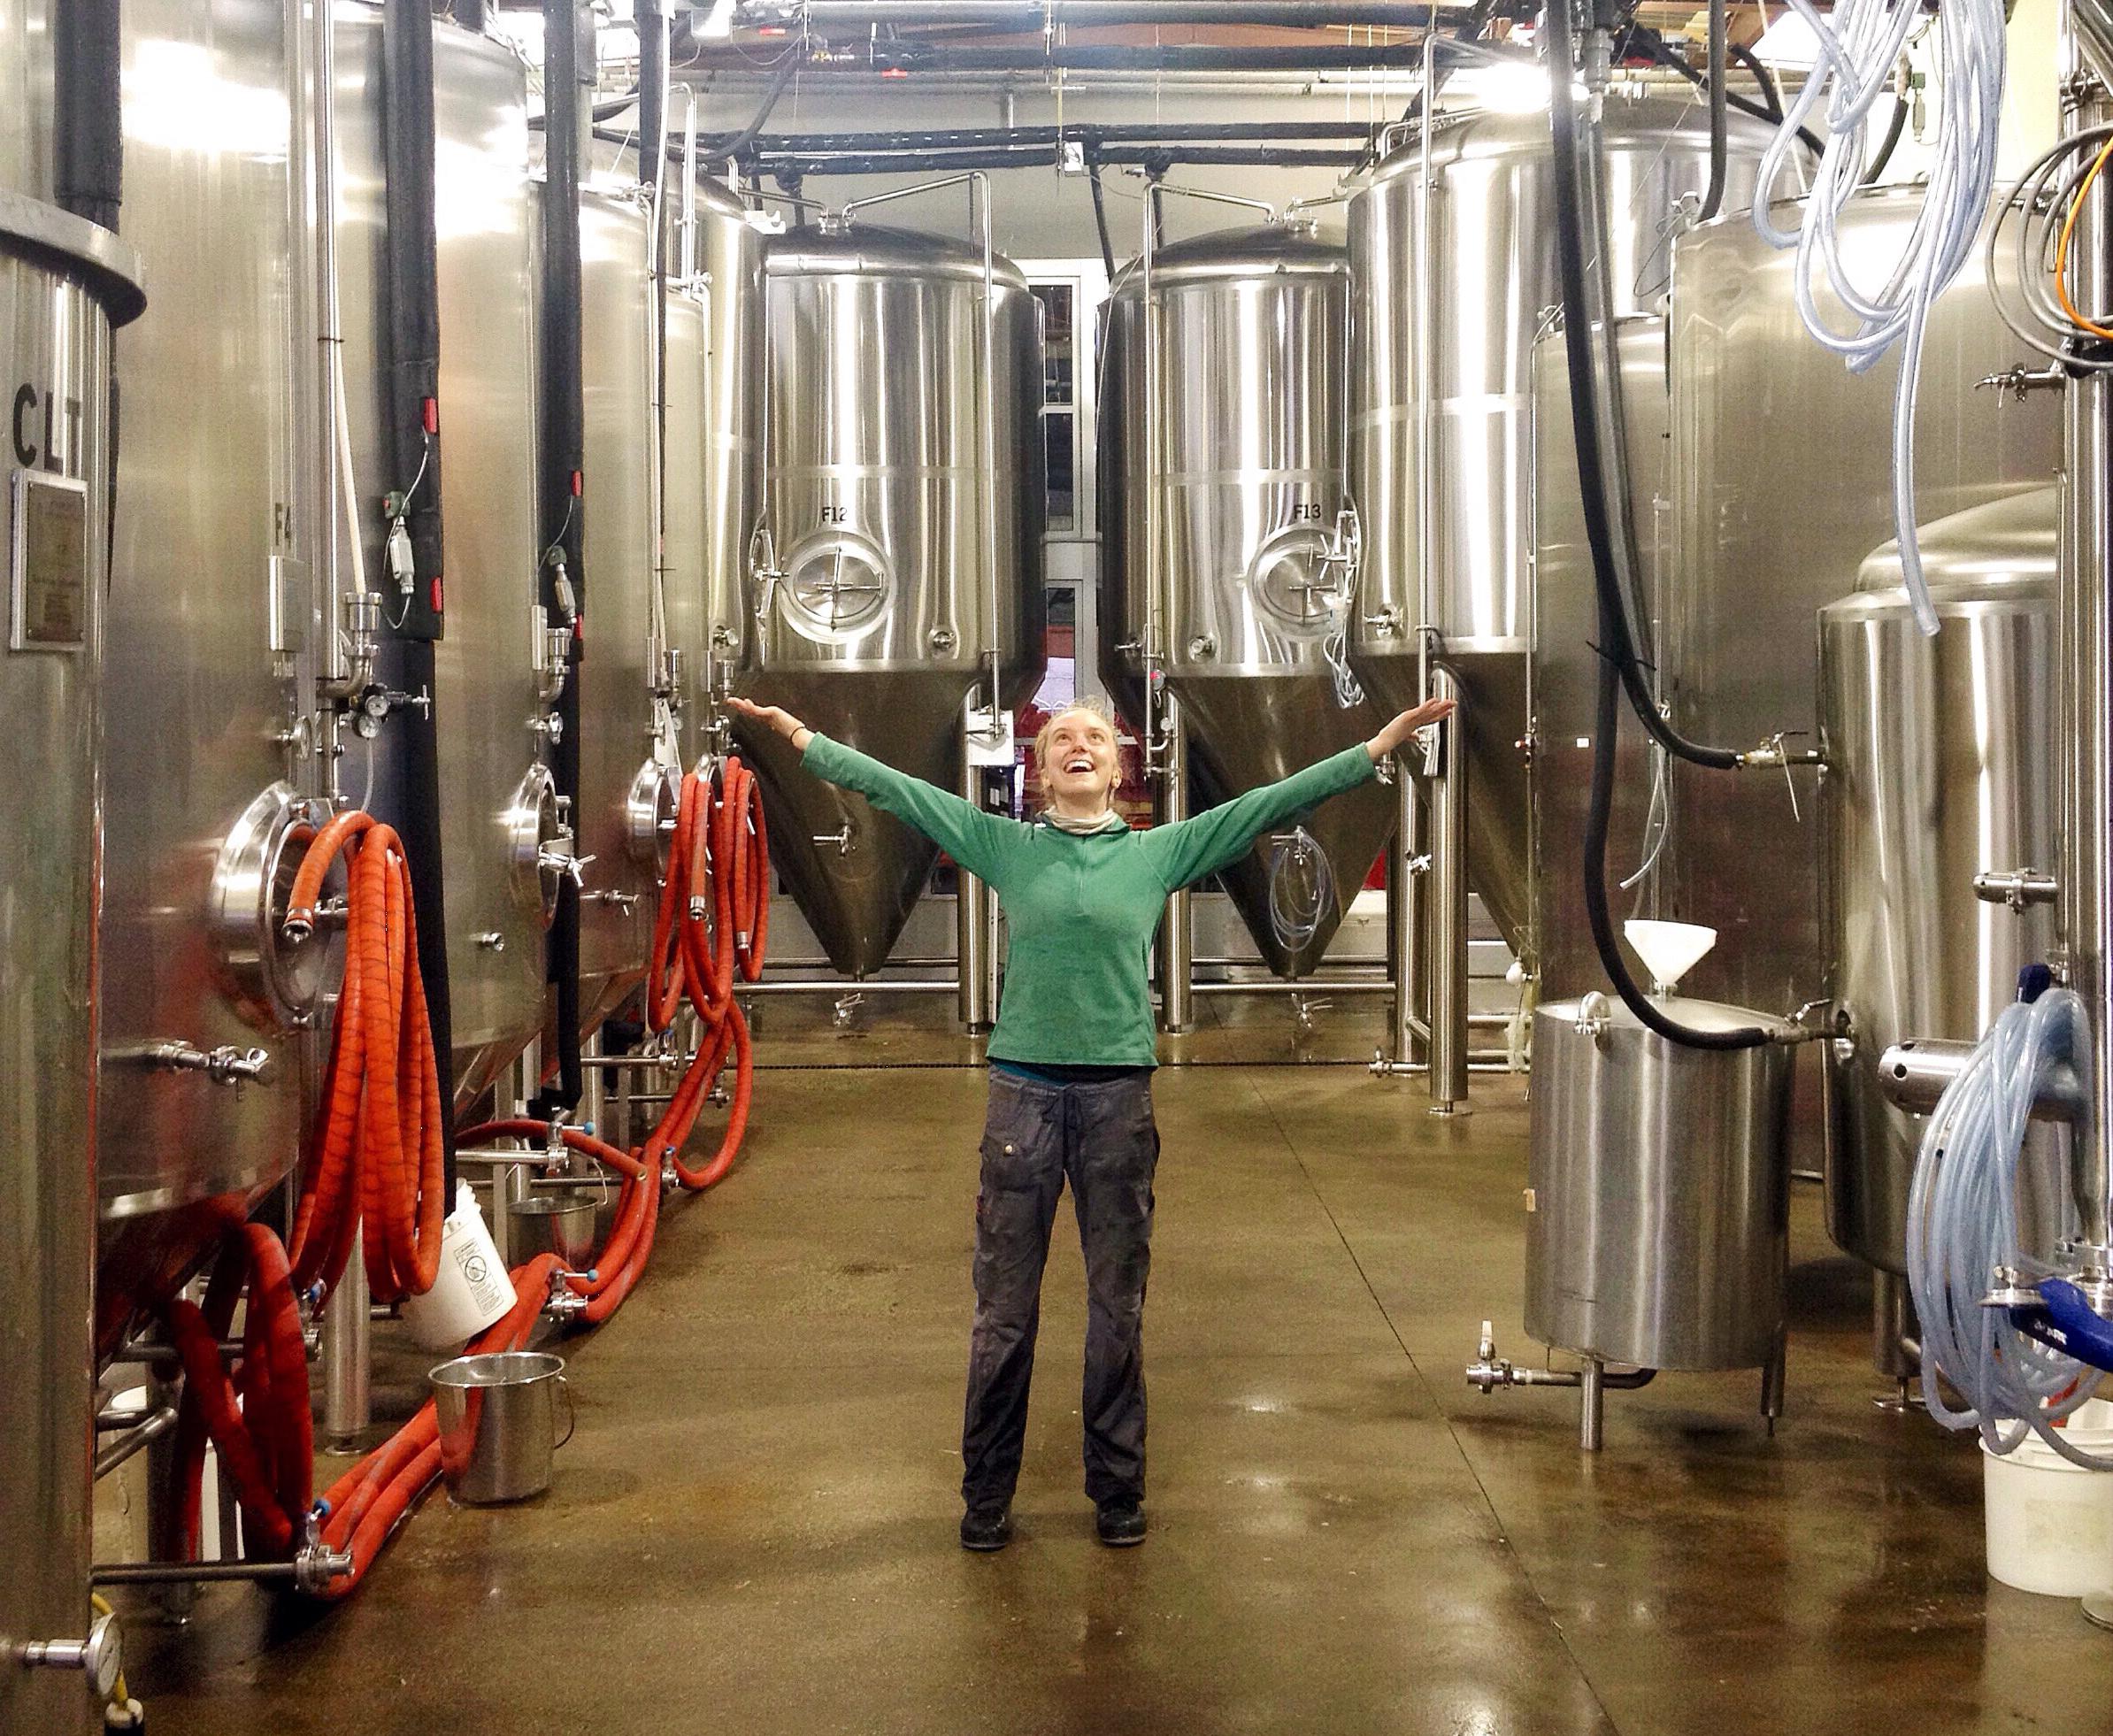 Amanda-Brewery.jpg#asset:8192